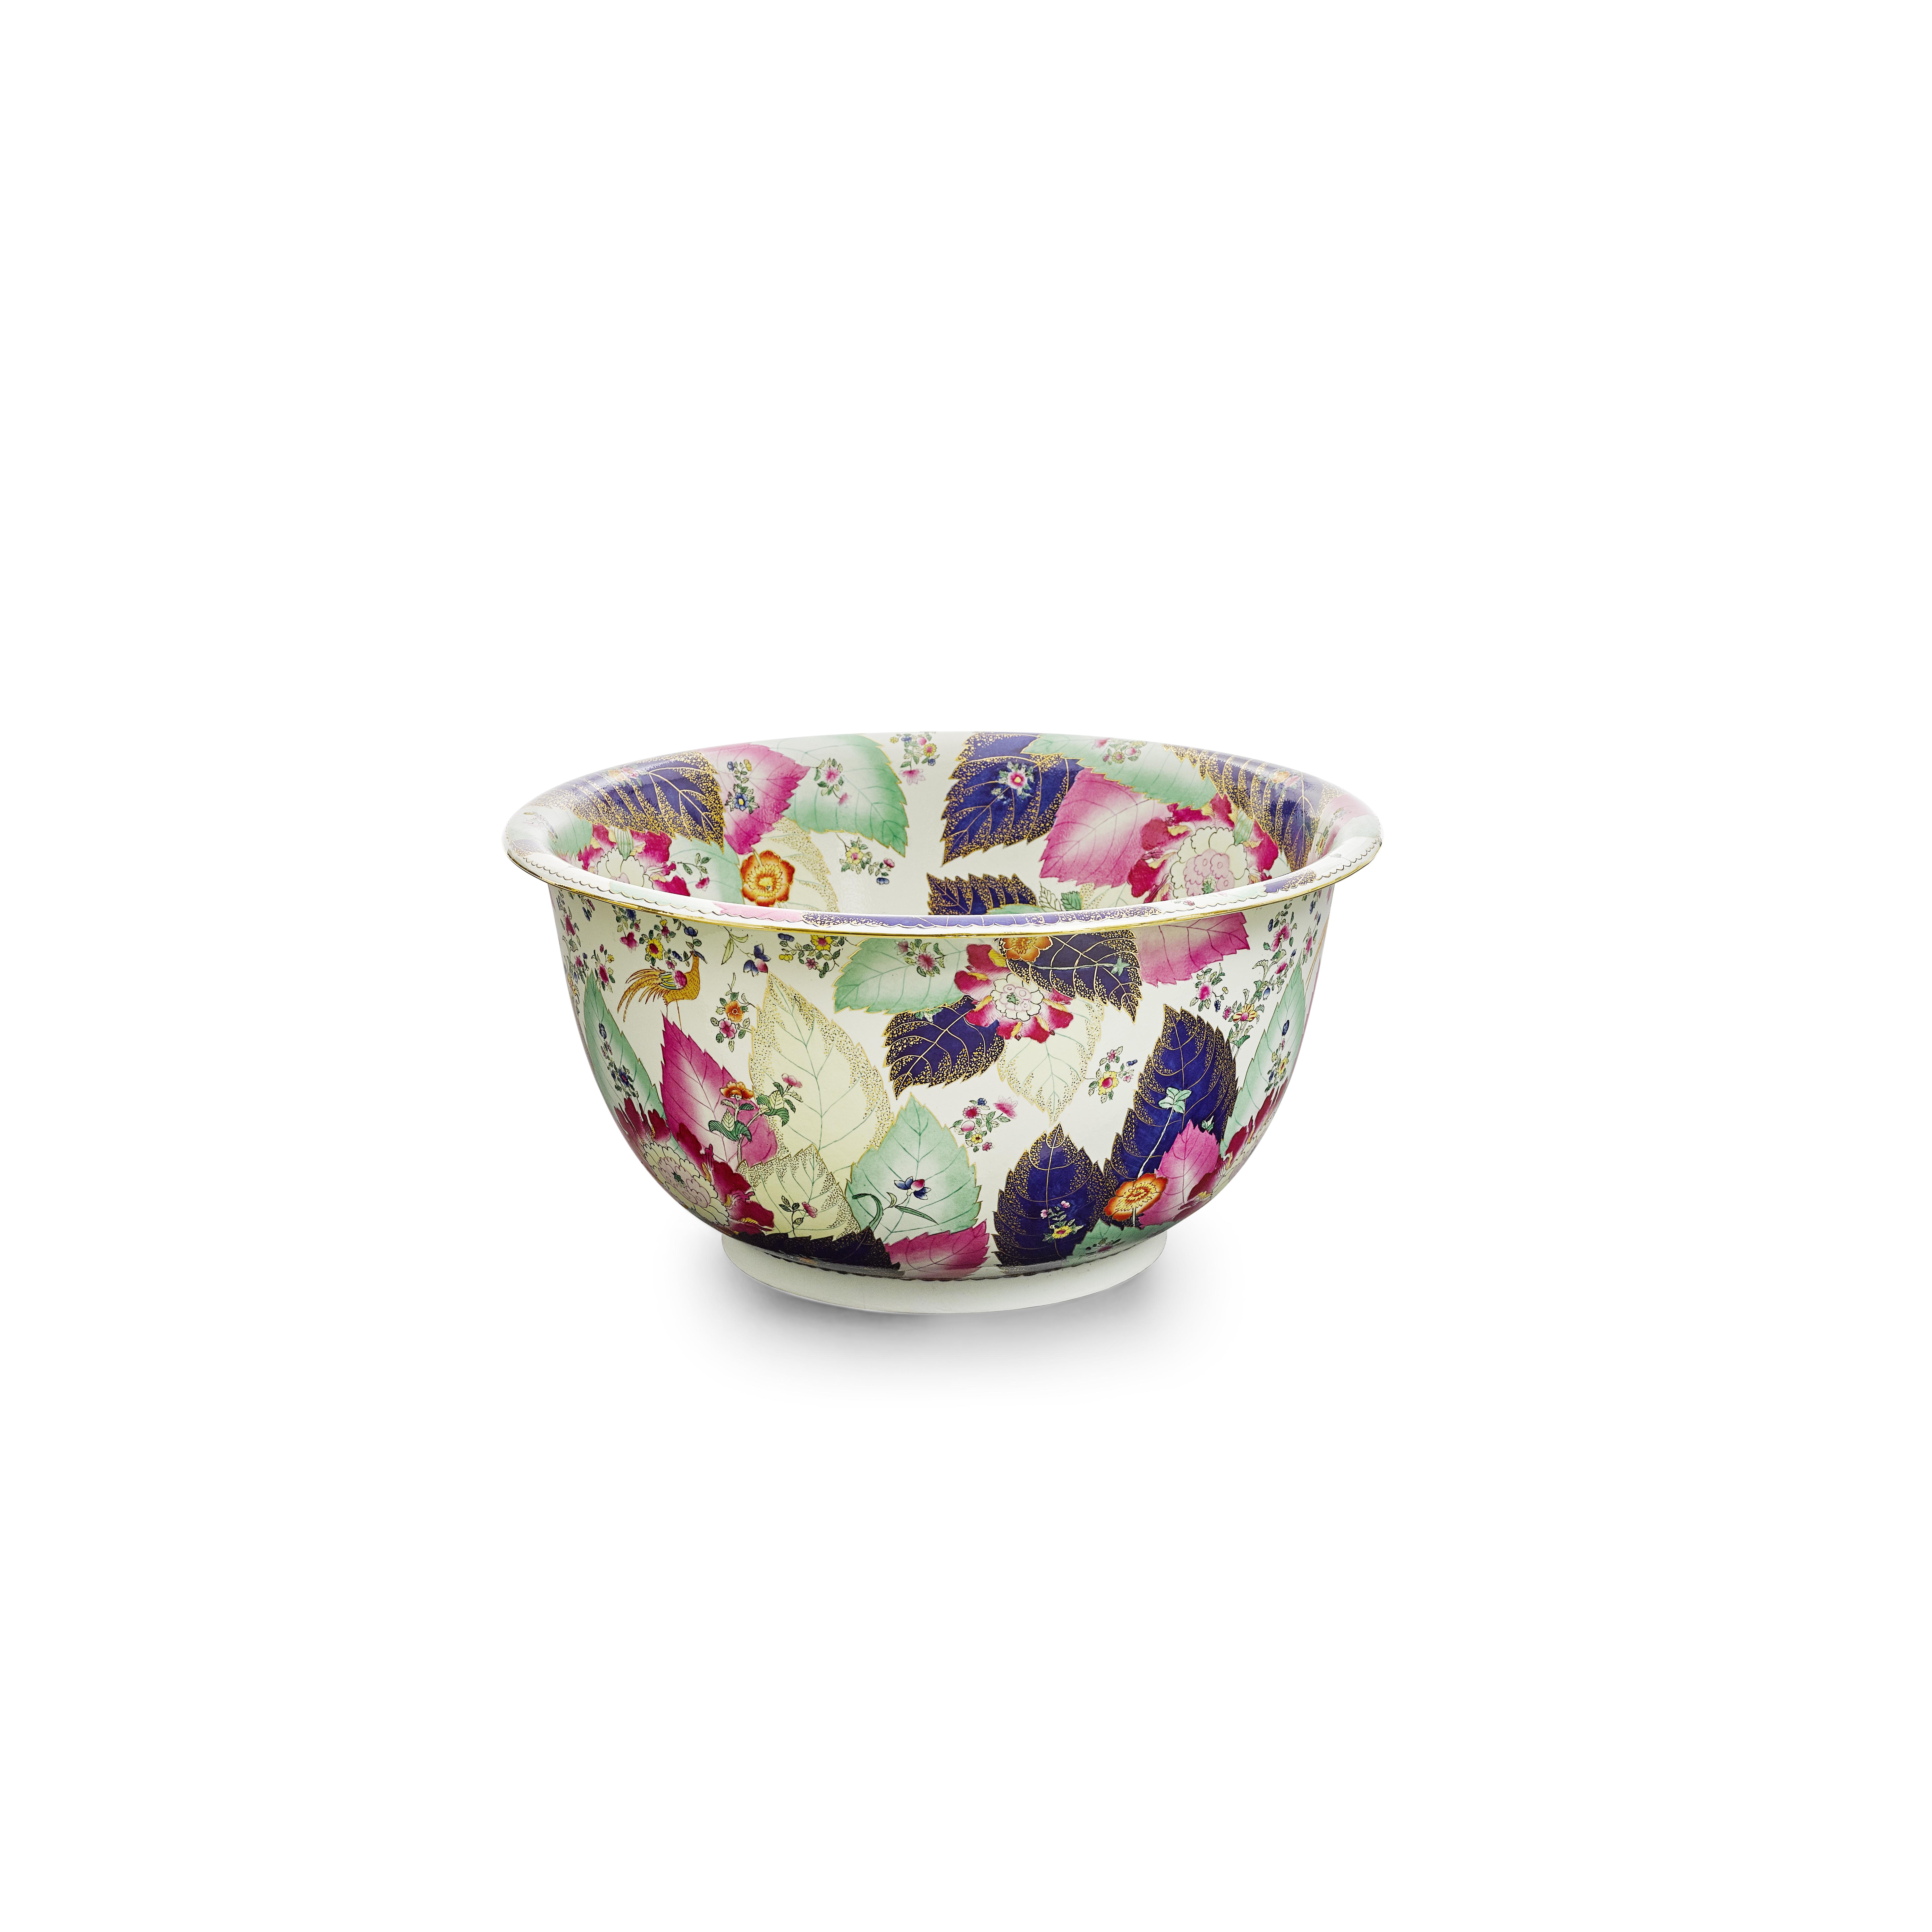 Lot 247 - A Chinese Porcelain tobacco leaf bowl Modern